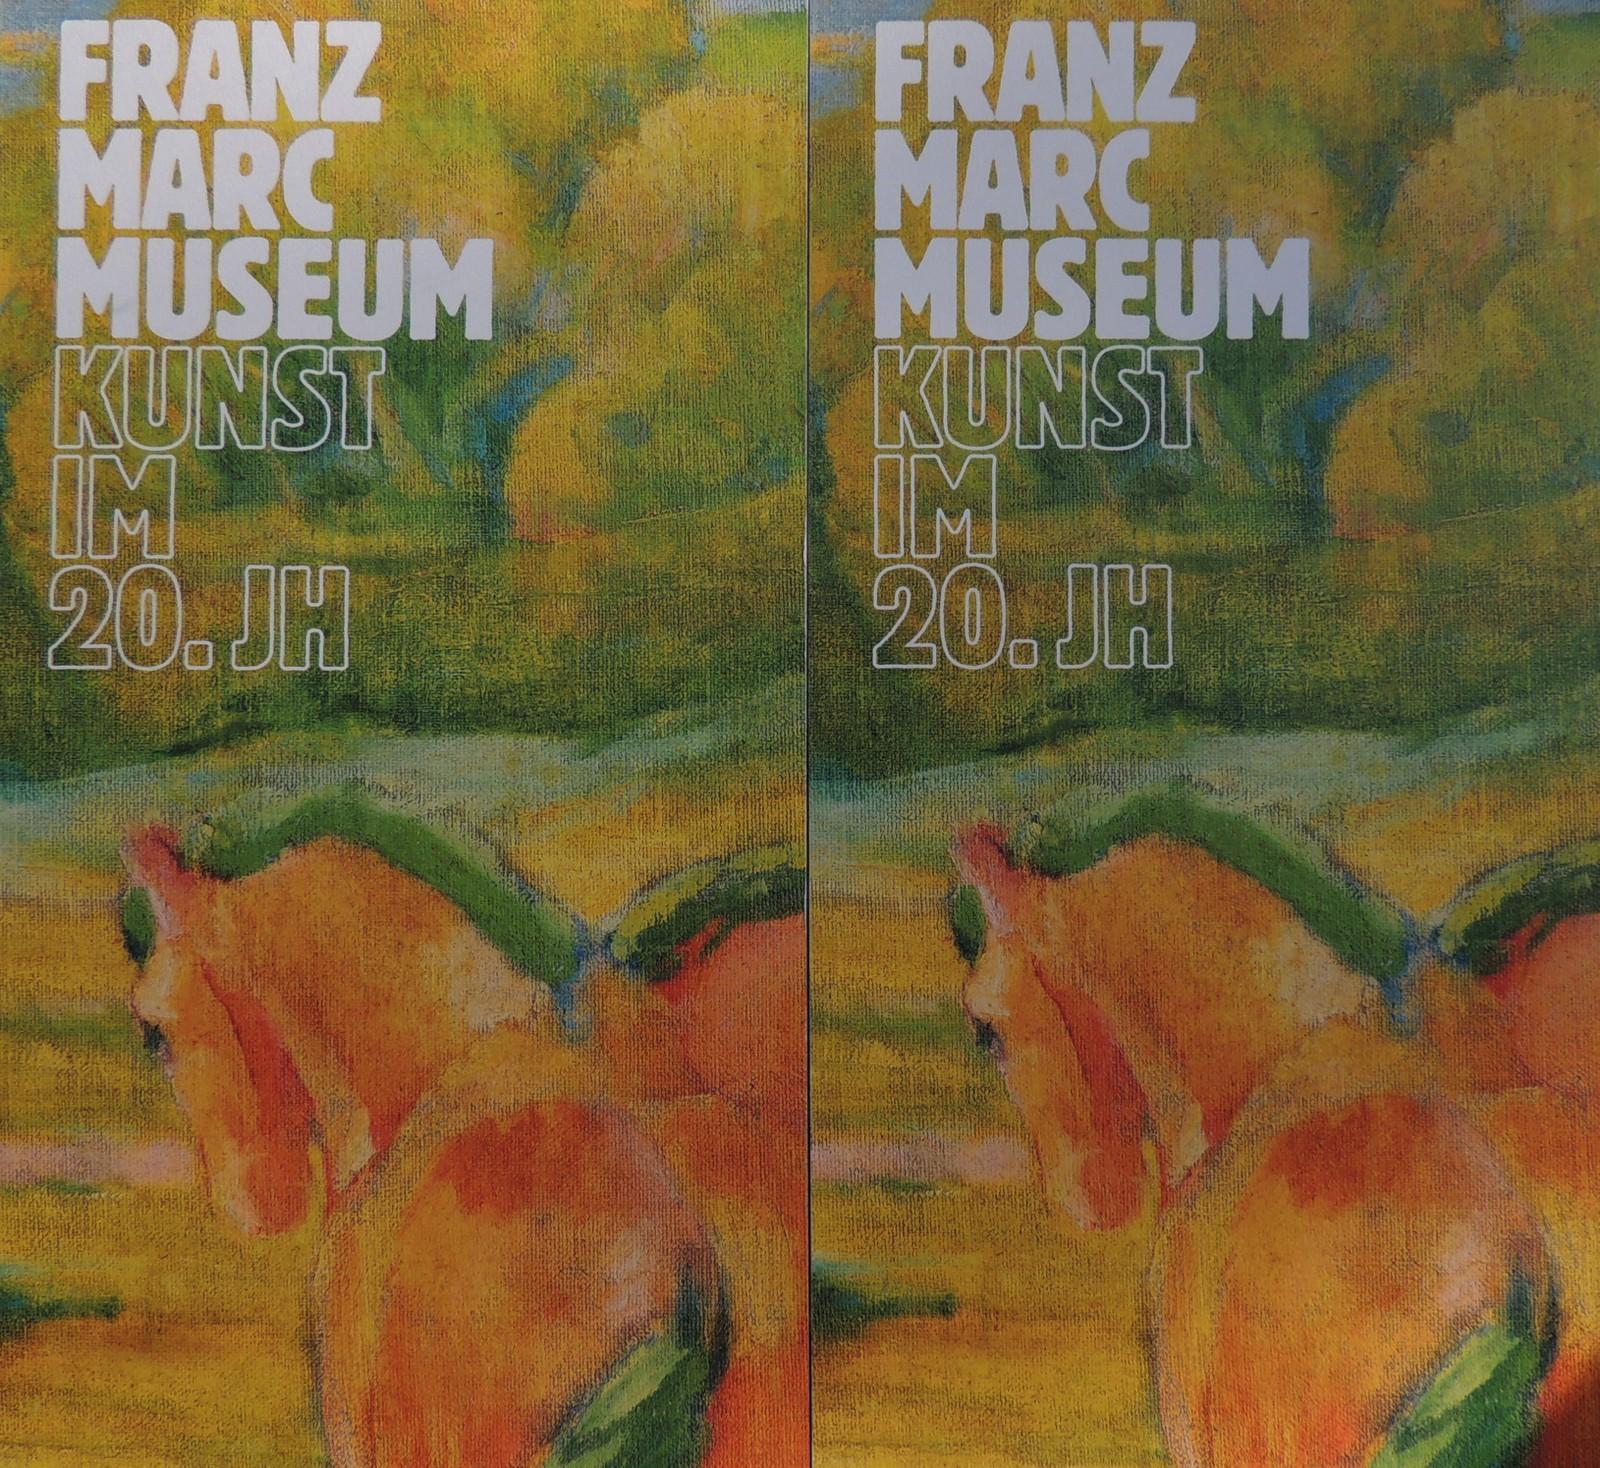 Das Blaue Land - Franz-Marc-Museum in Kochel